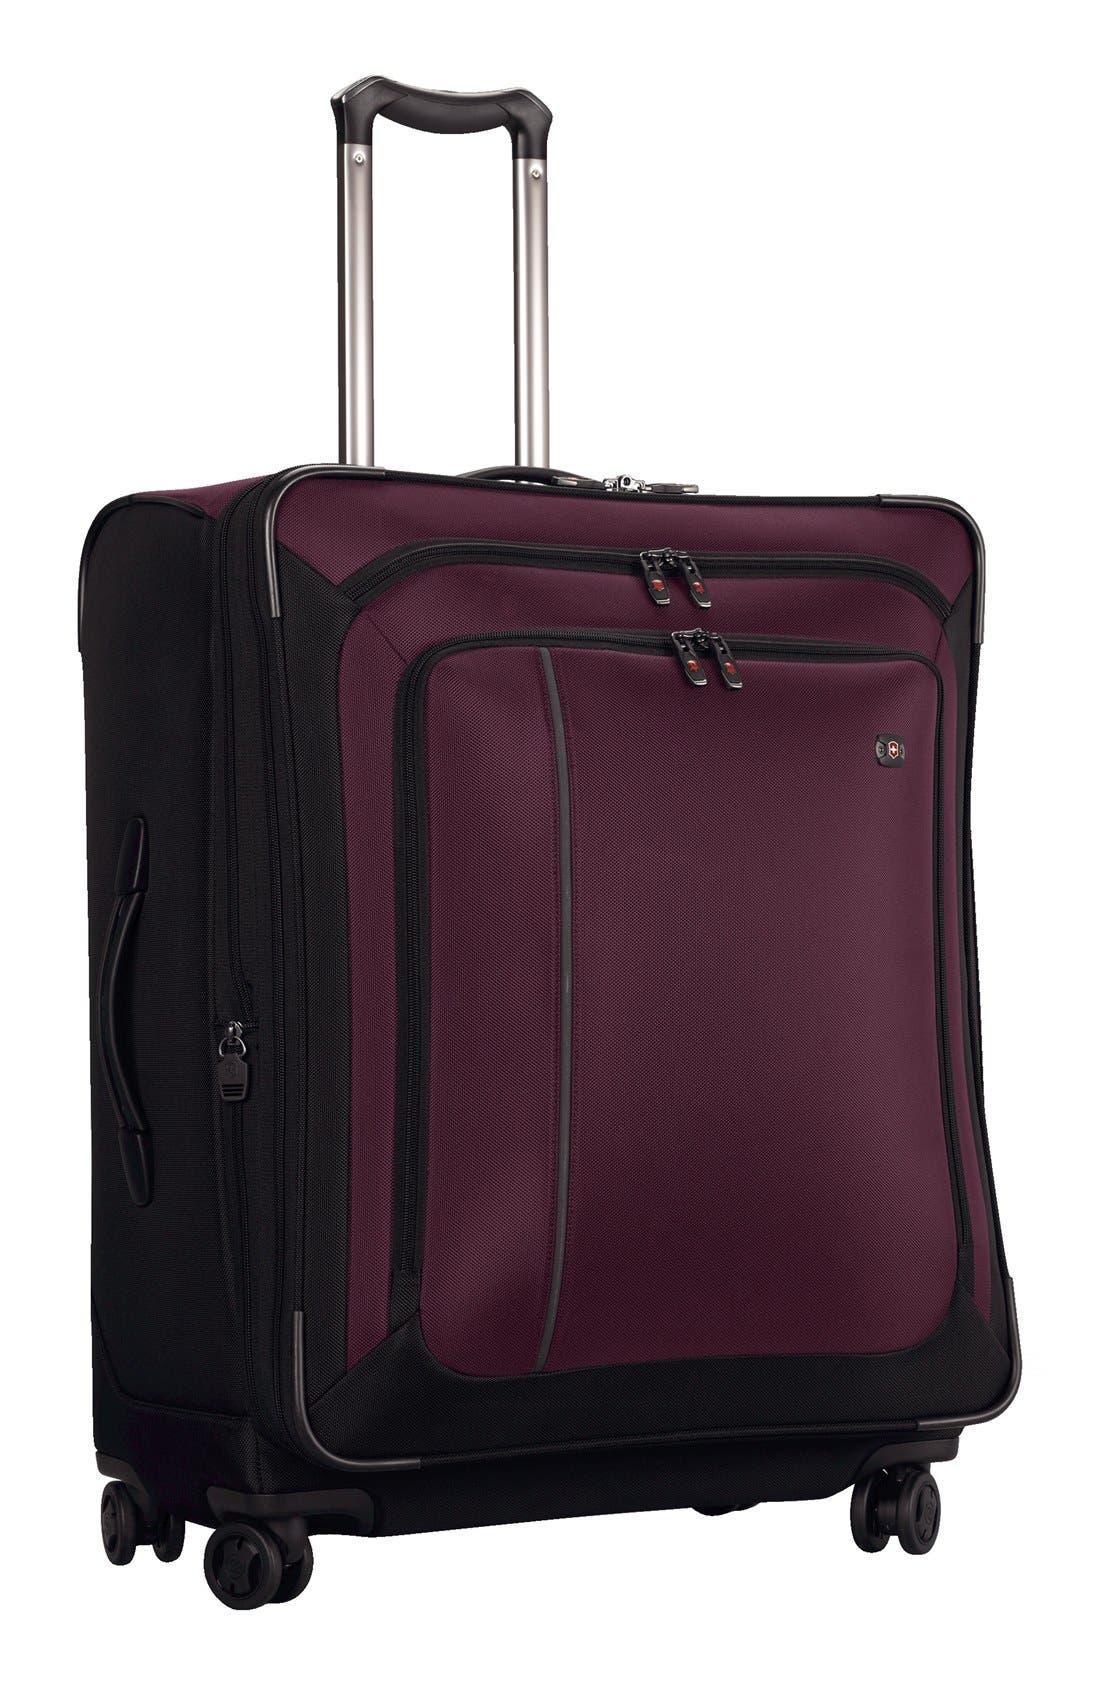 Main Image - Victorinox Swiss Army® 'Werks - Traveler' Rolling Suitcase (24 Inch)